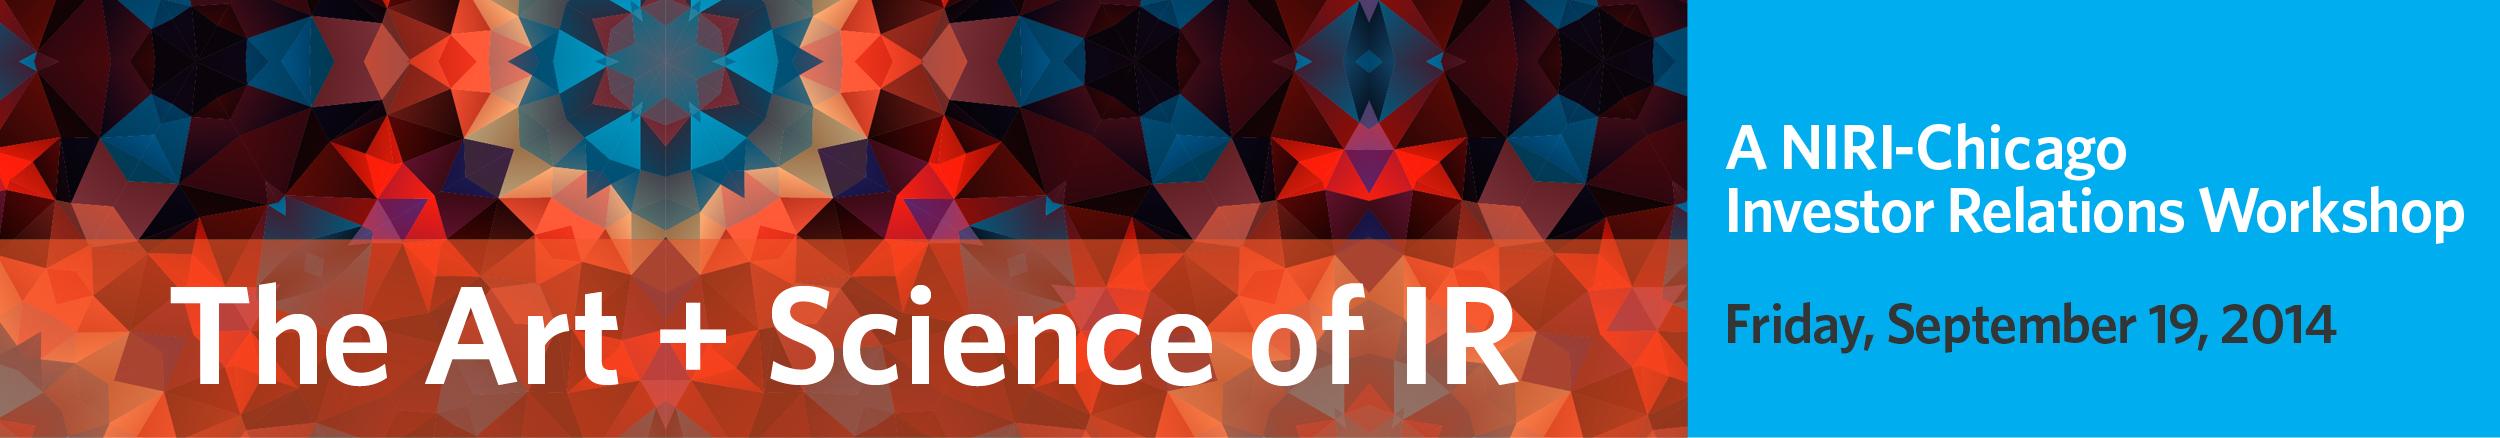 NIRI 2014_Art+Science_Banner_final_300dpi